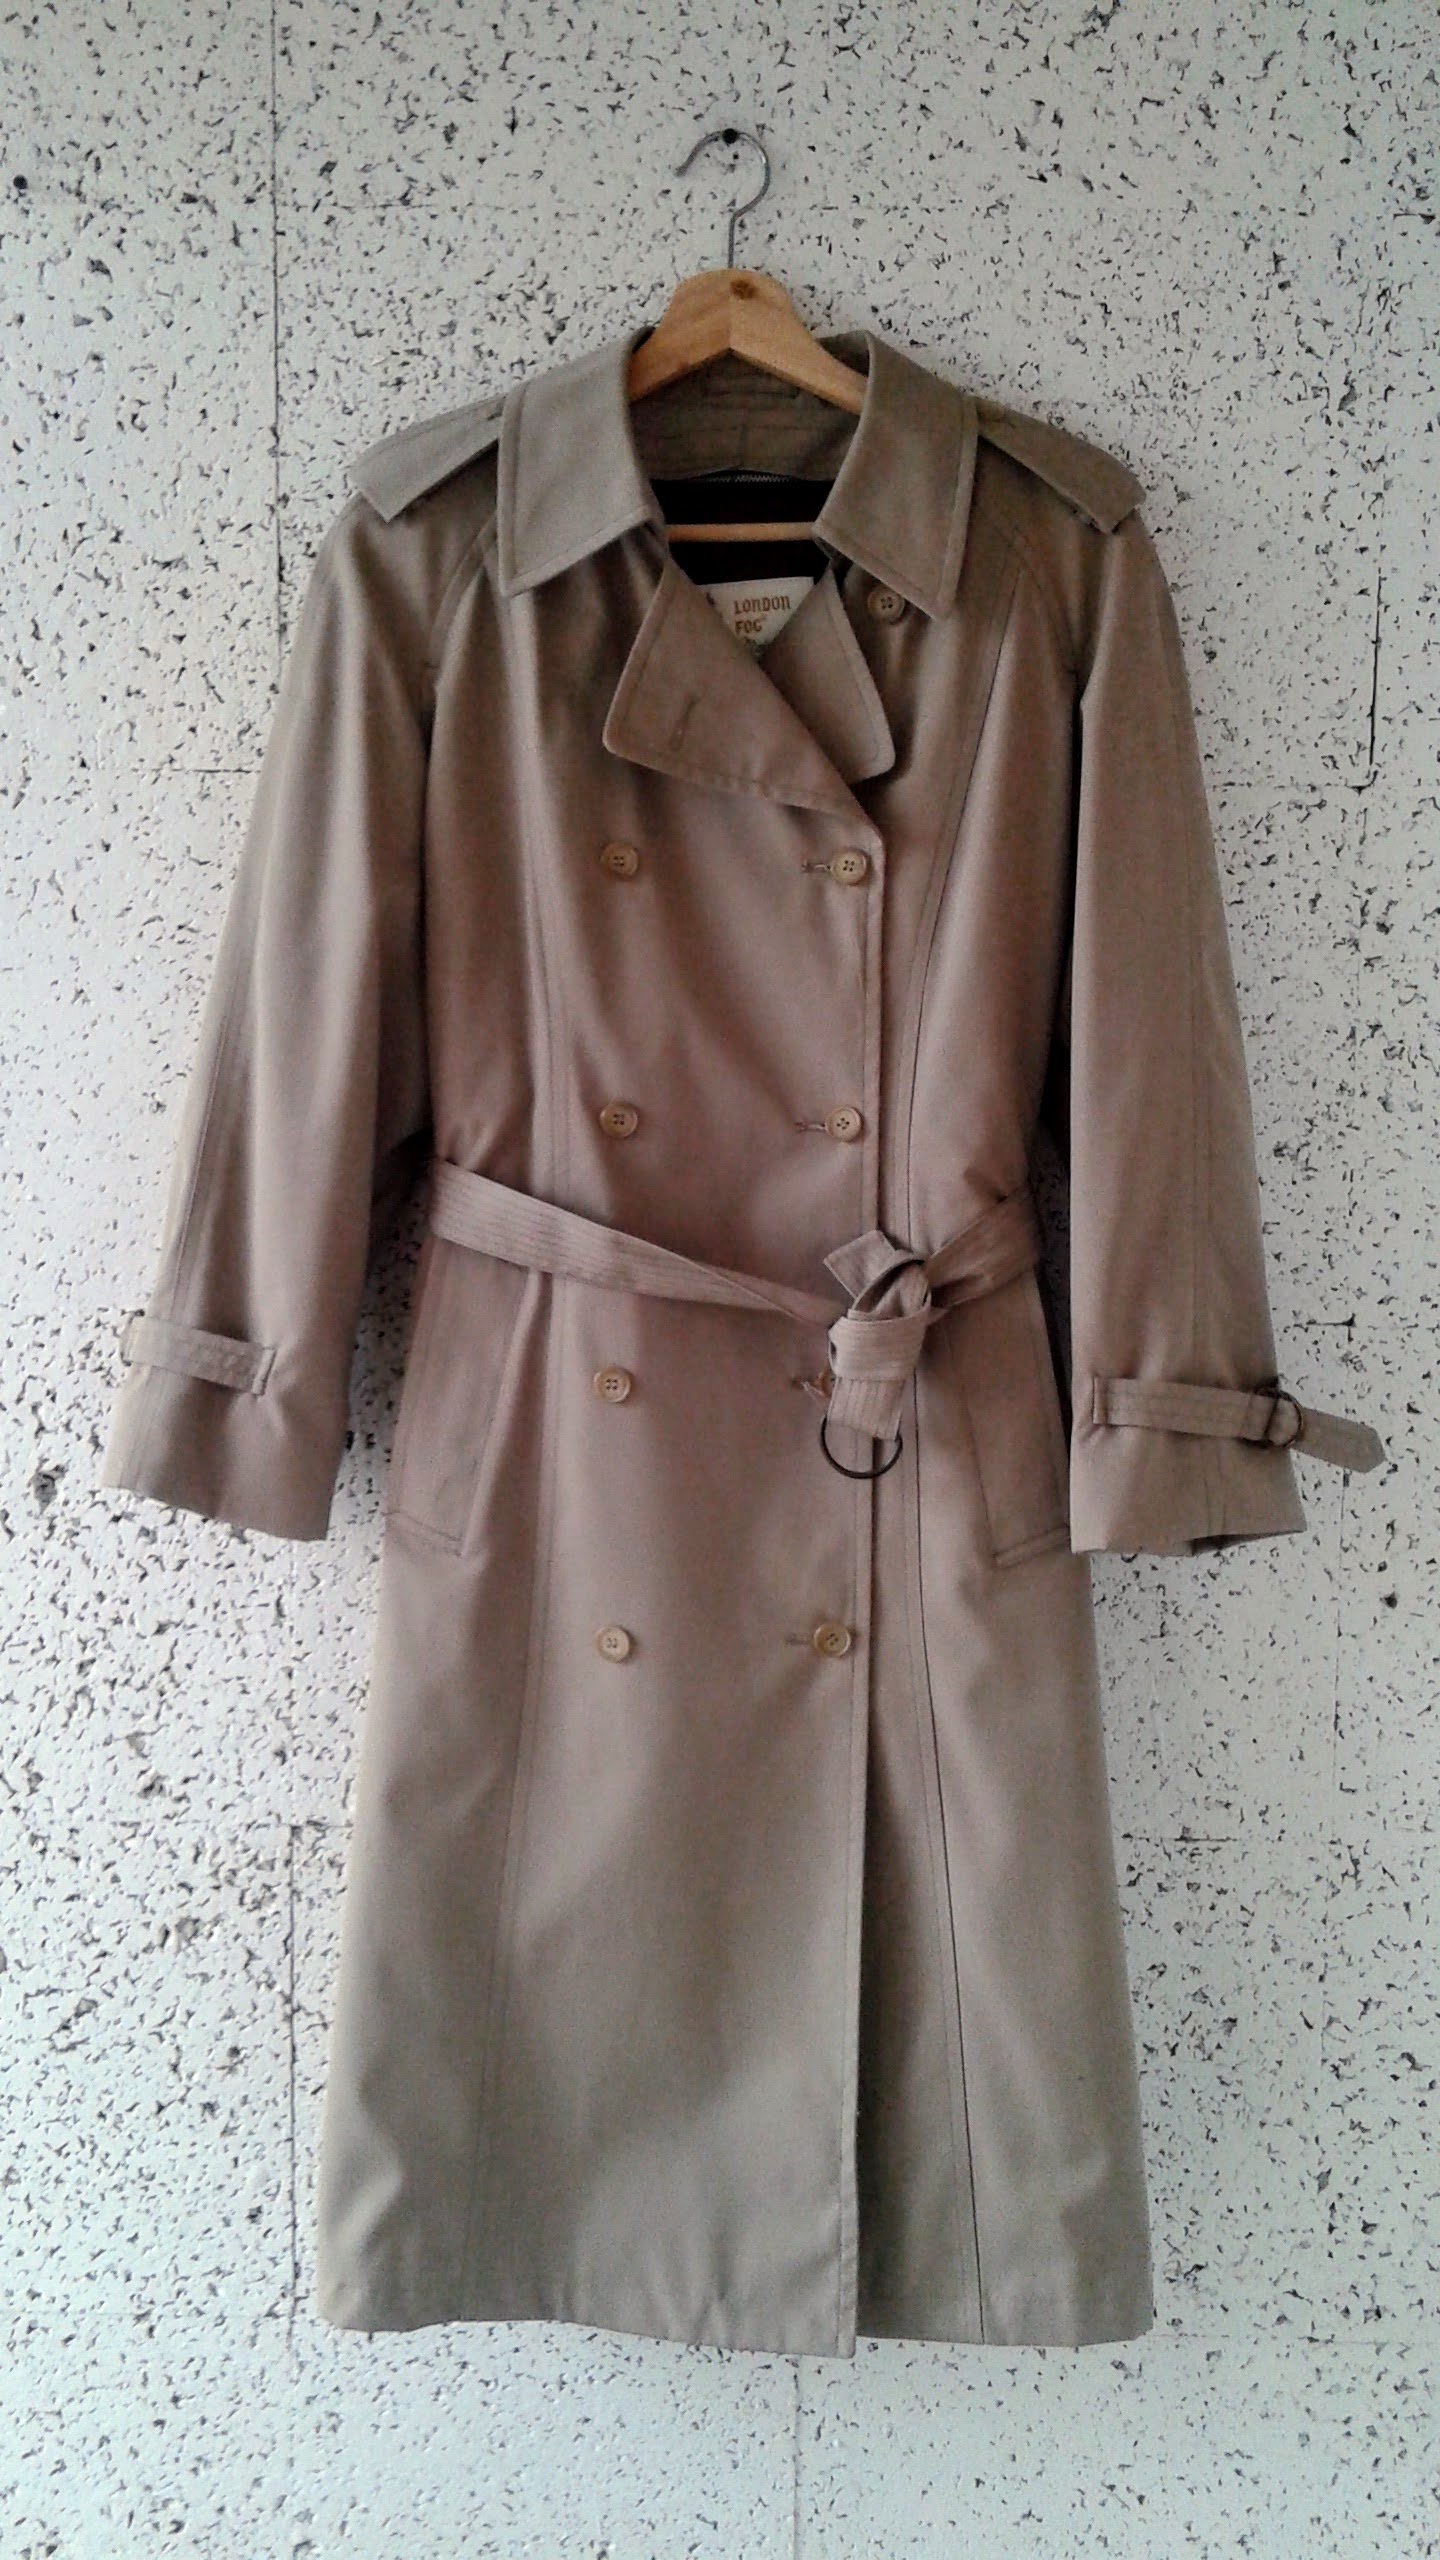 London Fog coat; Size 10, $58